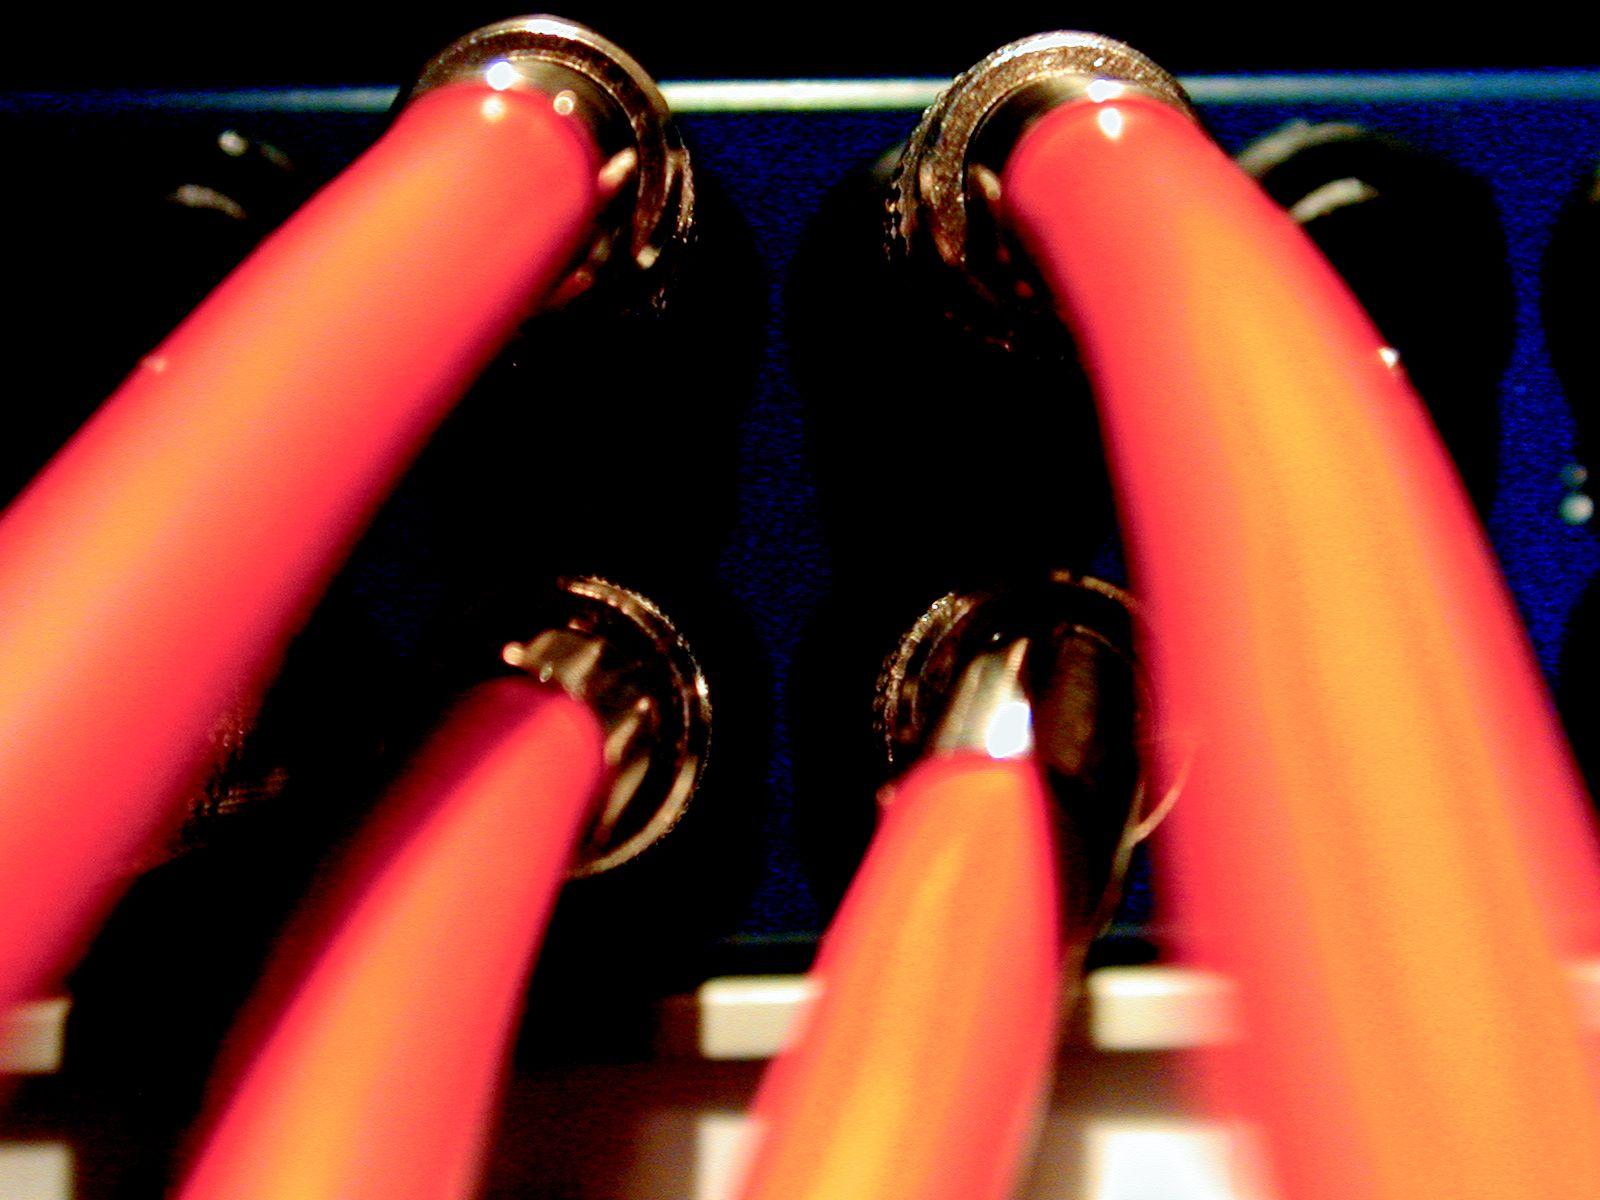 wires orange plugs jacks cables